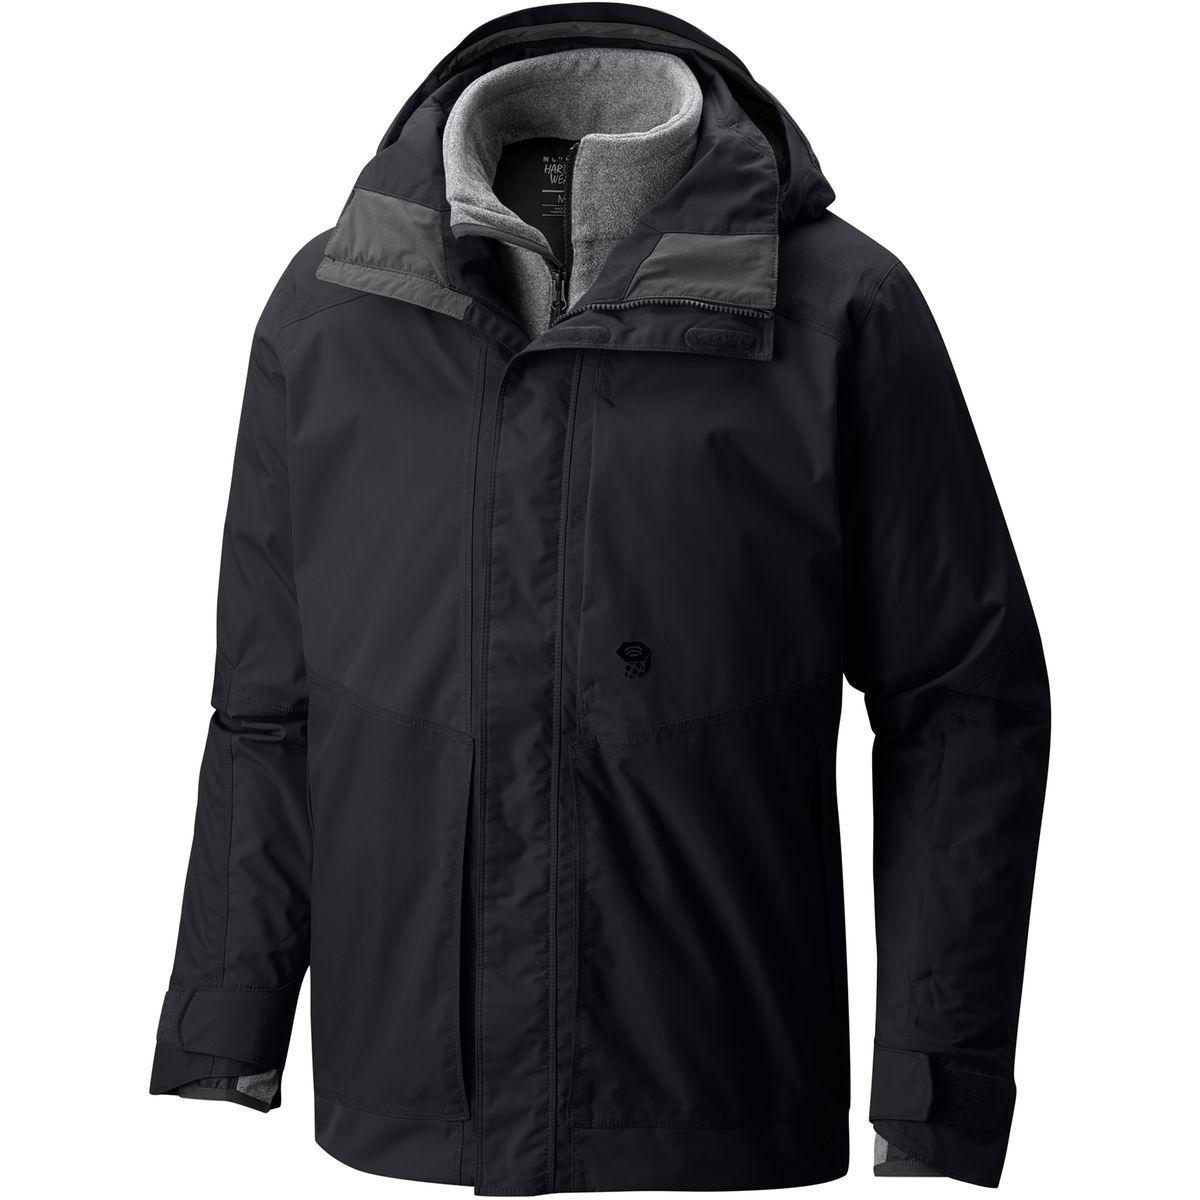 Mountain Hardwear Killswitch Composite 3-in1 Insulated Jacket - Men